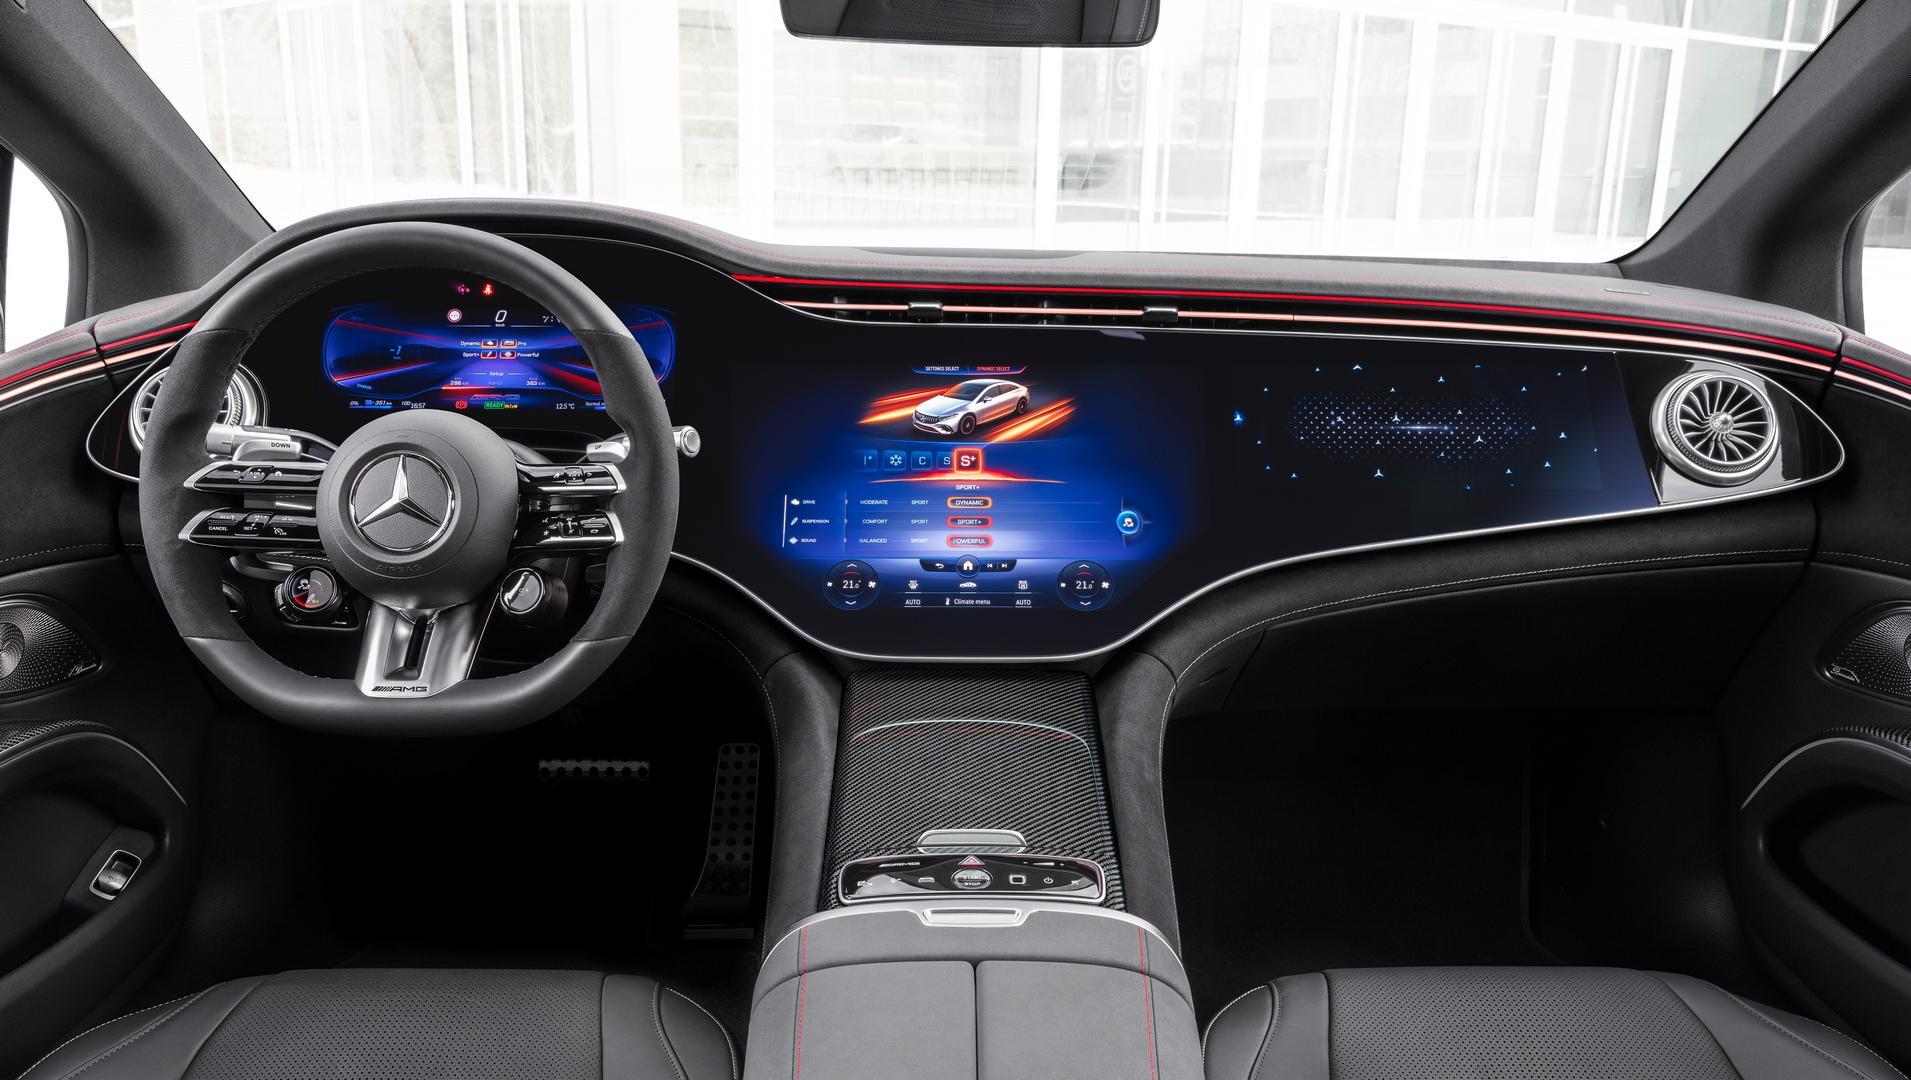 Mercedes-AMG EQS 53 4MATIC+, 2021Mercedes-AMG EQS 53 screen